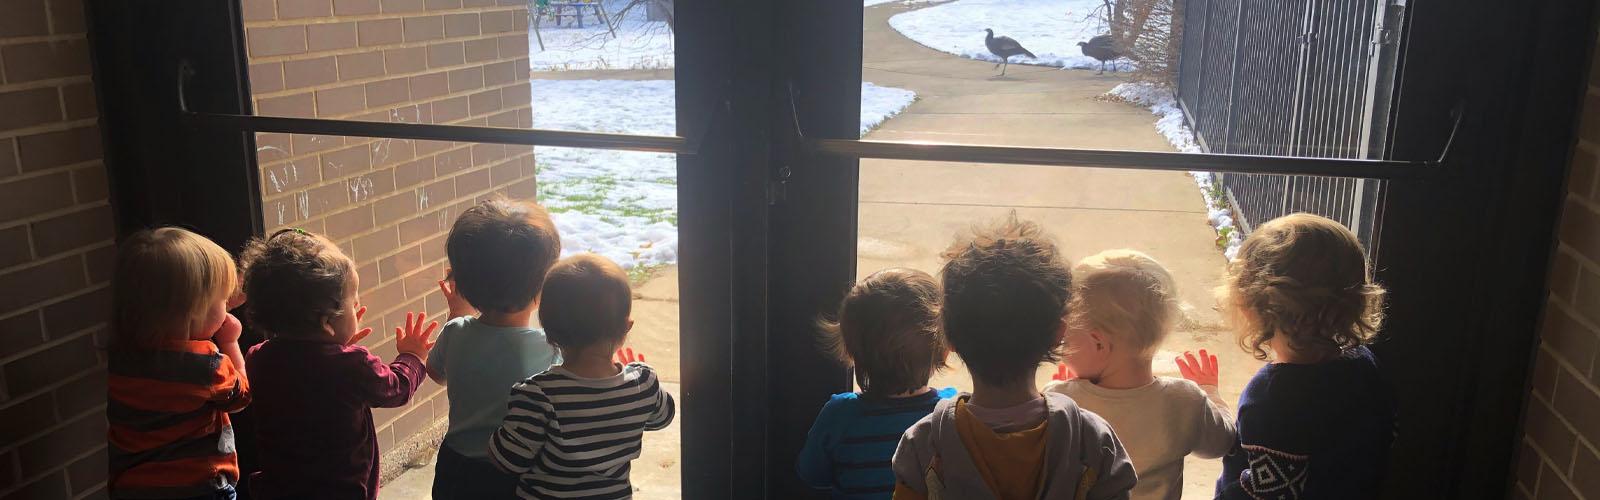 Early childhood learners